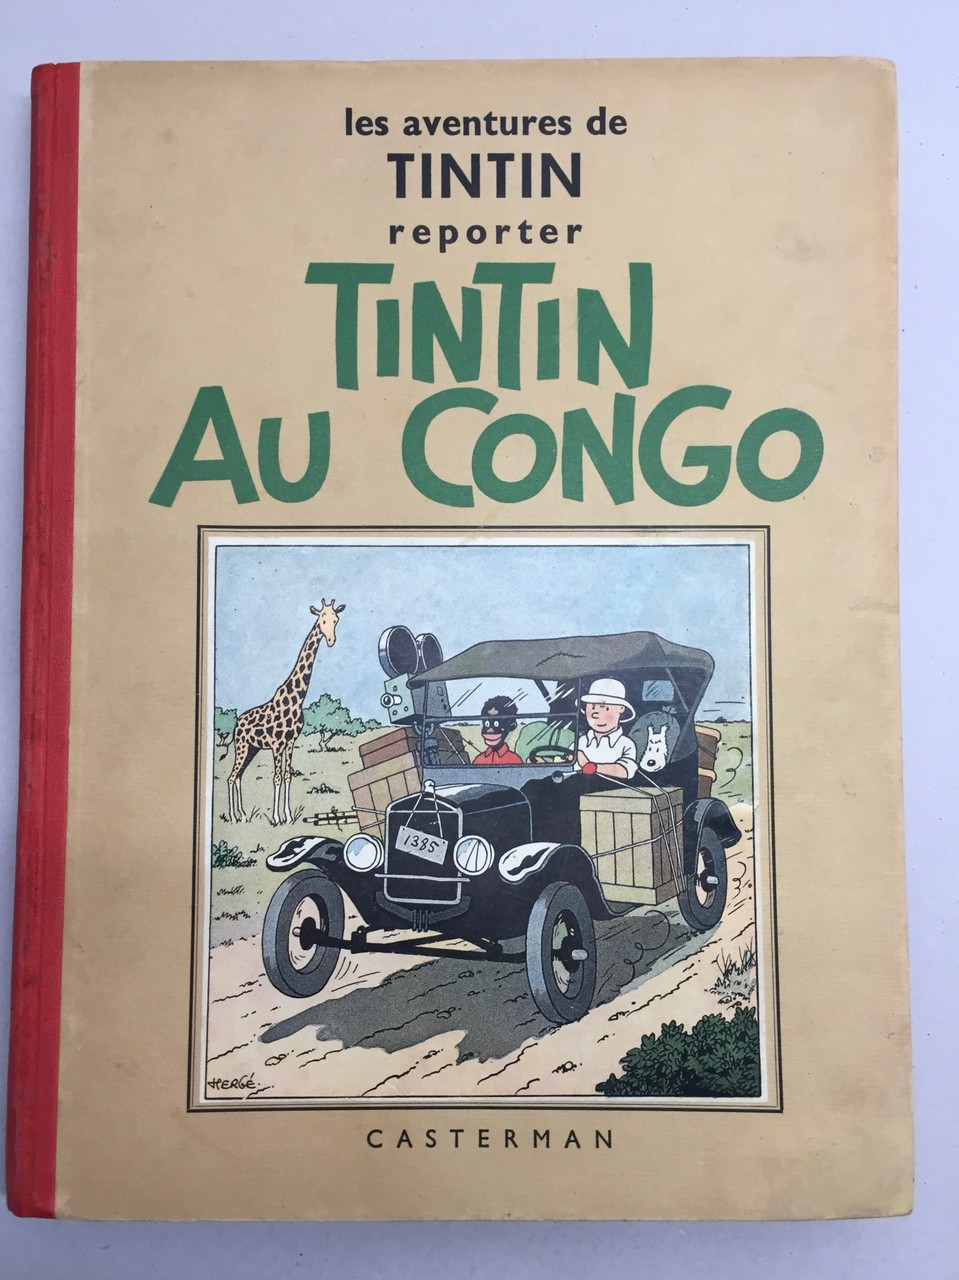 restauration Tintin, ( dos et coins )